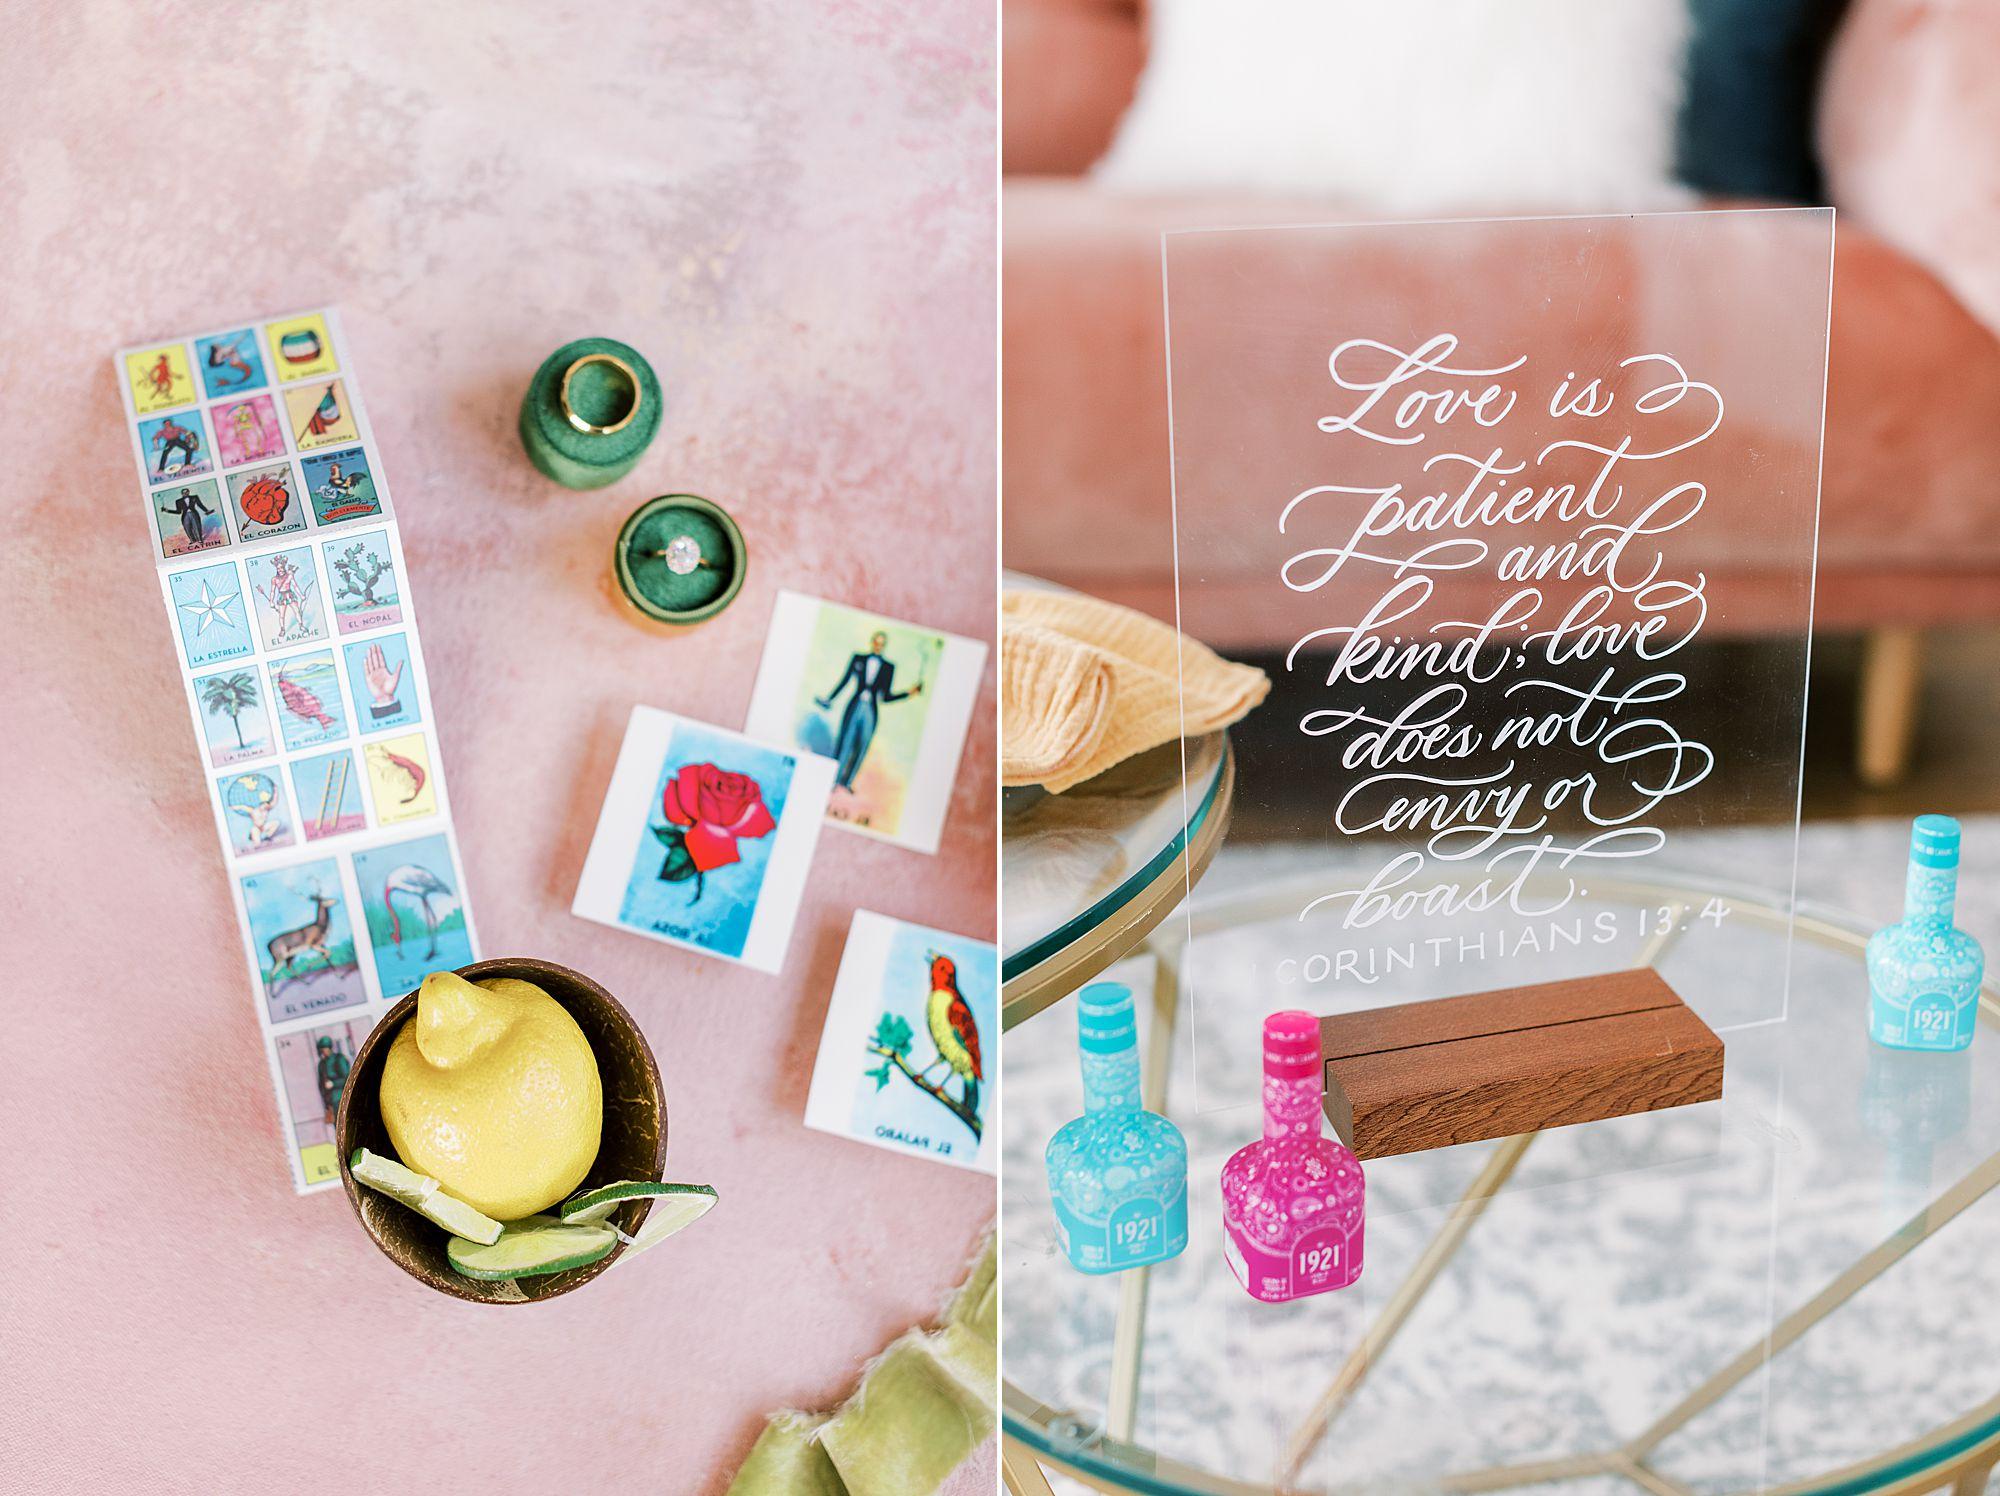 Cinco De Mayo Inspiration for Your FIesta - Party Crush Studio and Ashley Baumgartner_0010.jpg